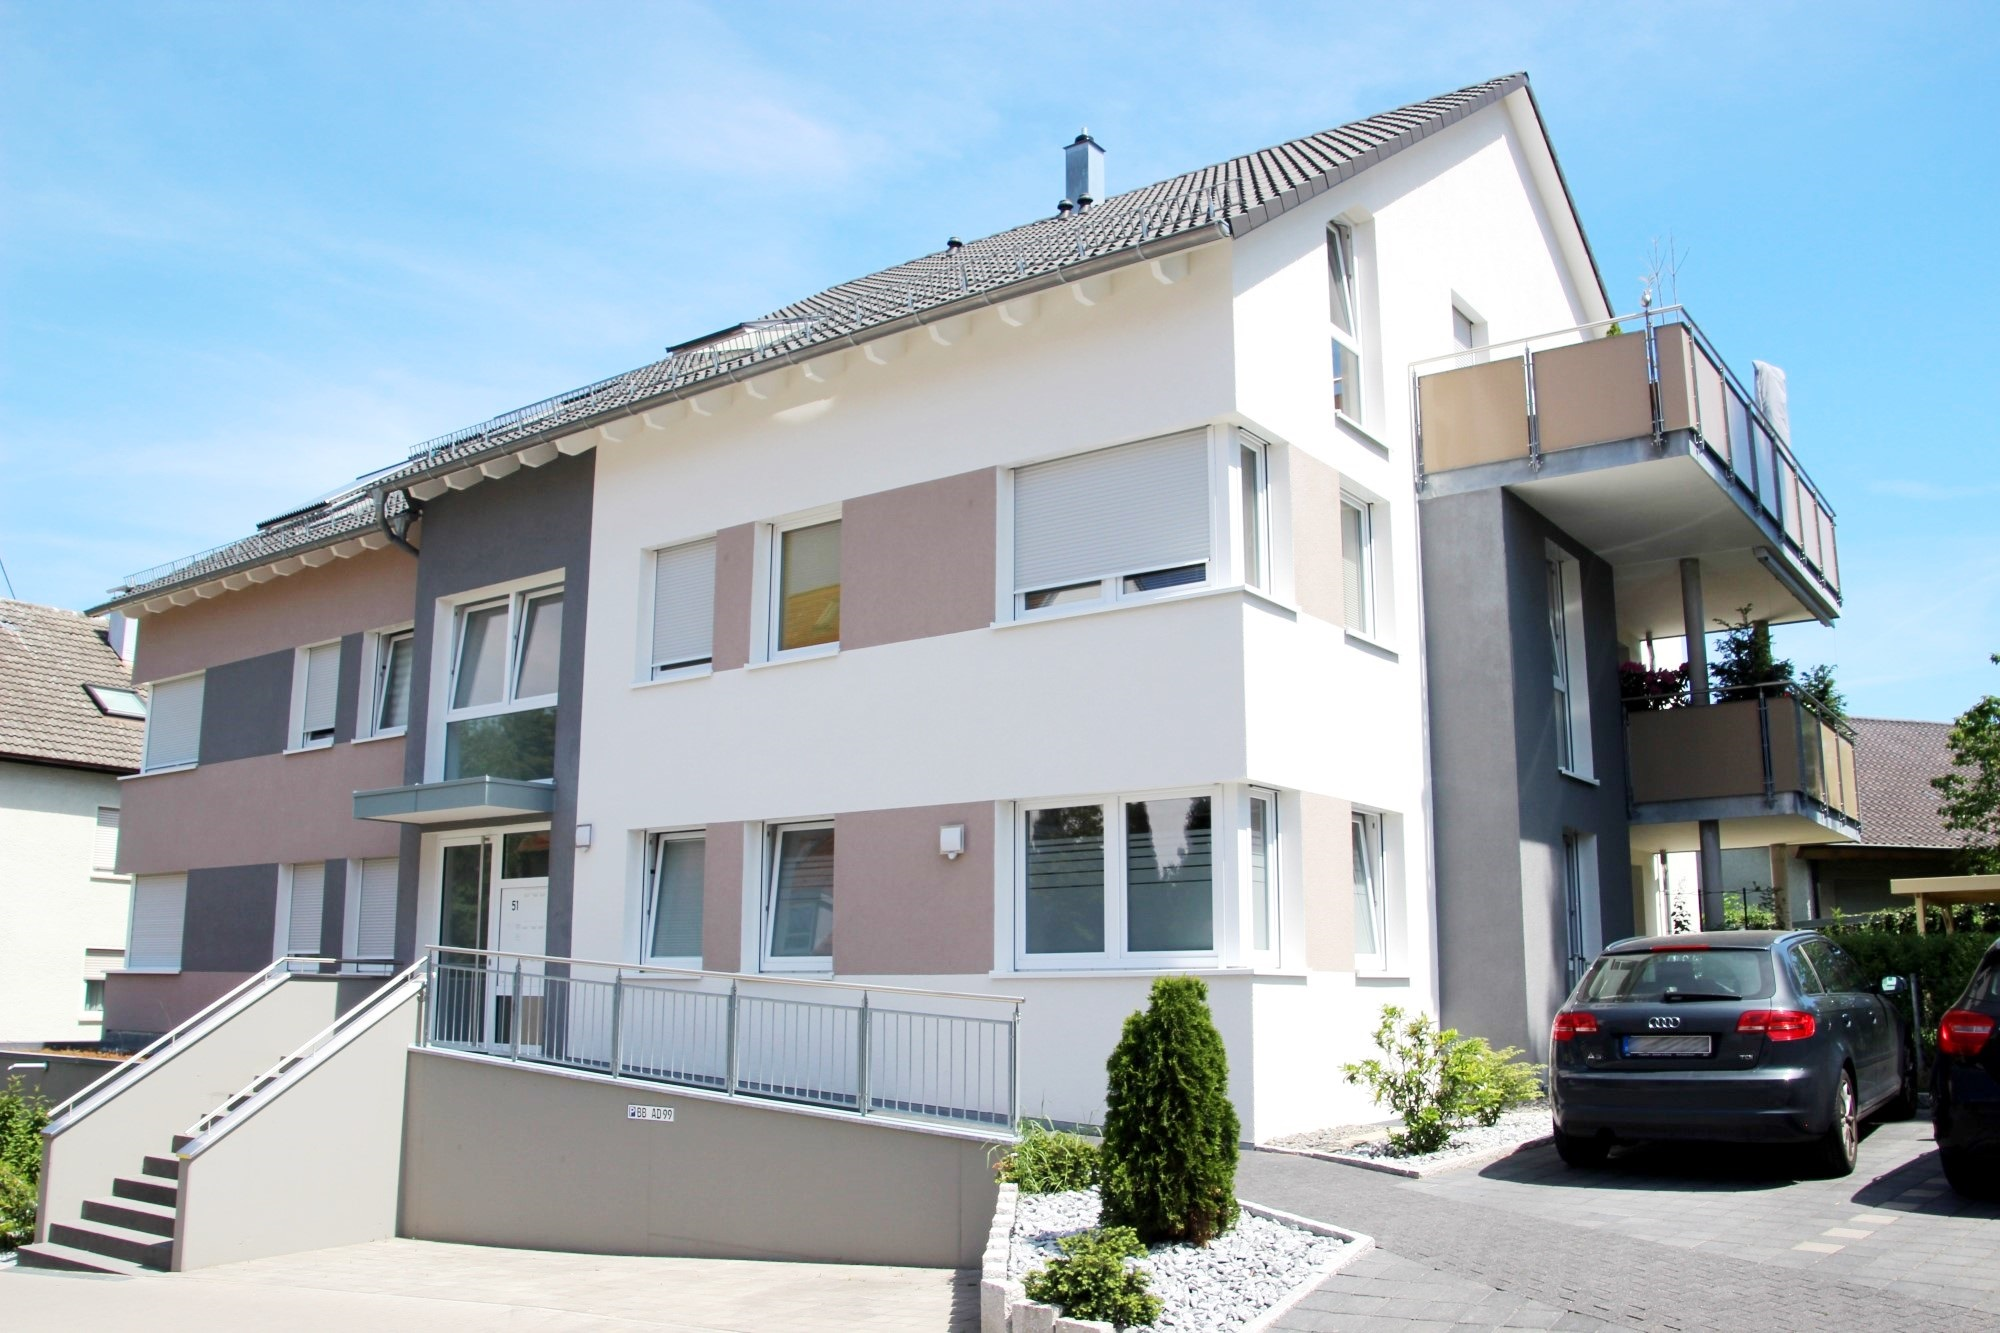 2014 | 5-Familienhaus Maichingerstraße in Magstadt, Architekt Dipl. Ing. Sandra Rapino